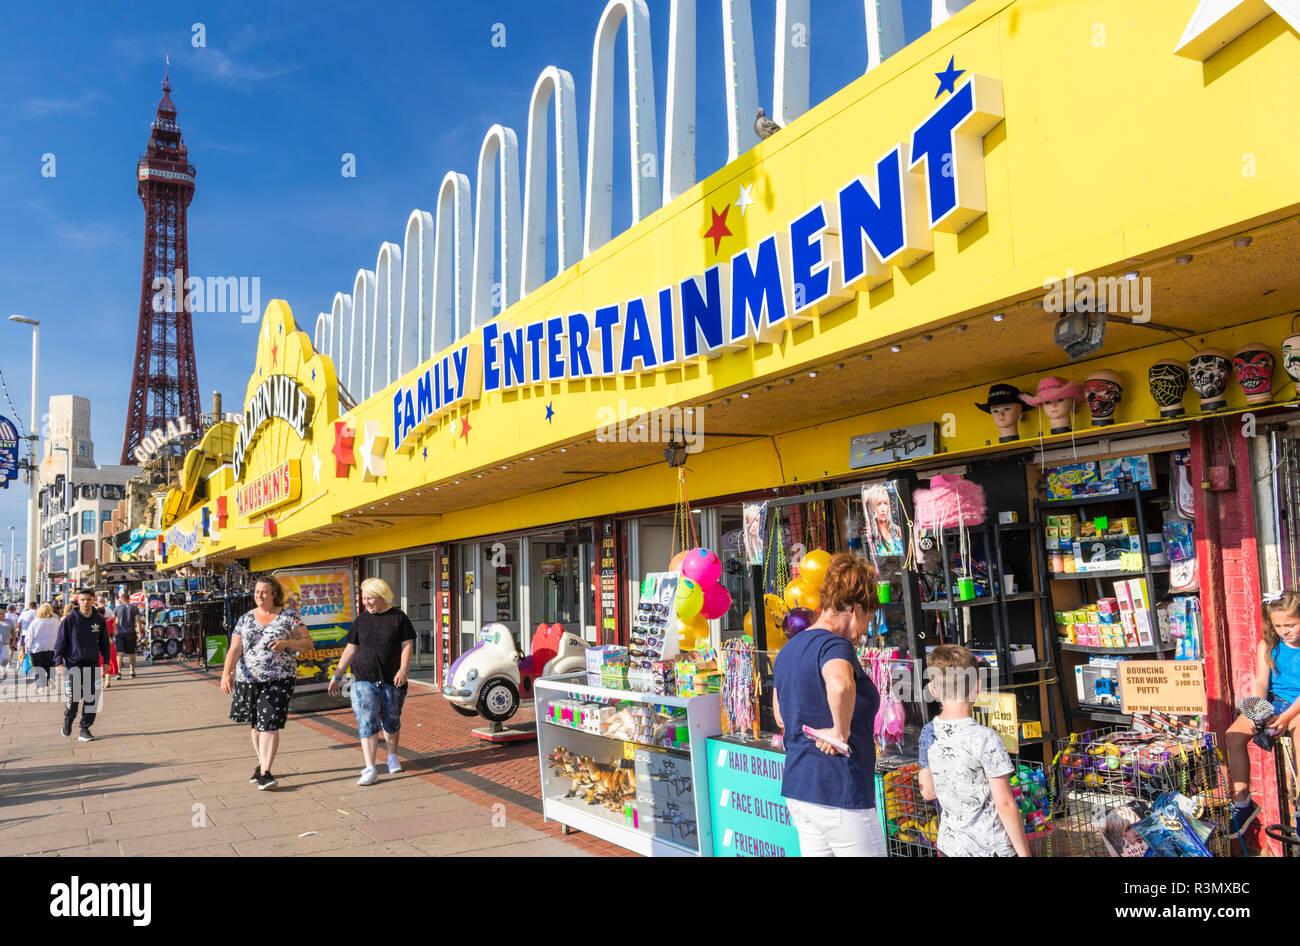 Blackpool tower and the Golden Mile amusements amusement arcade family entertainment seafront promenade Blackpool Lancashire England GB UK Europe - Stock Image